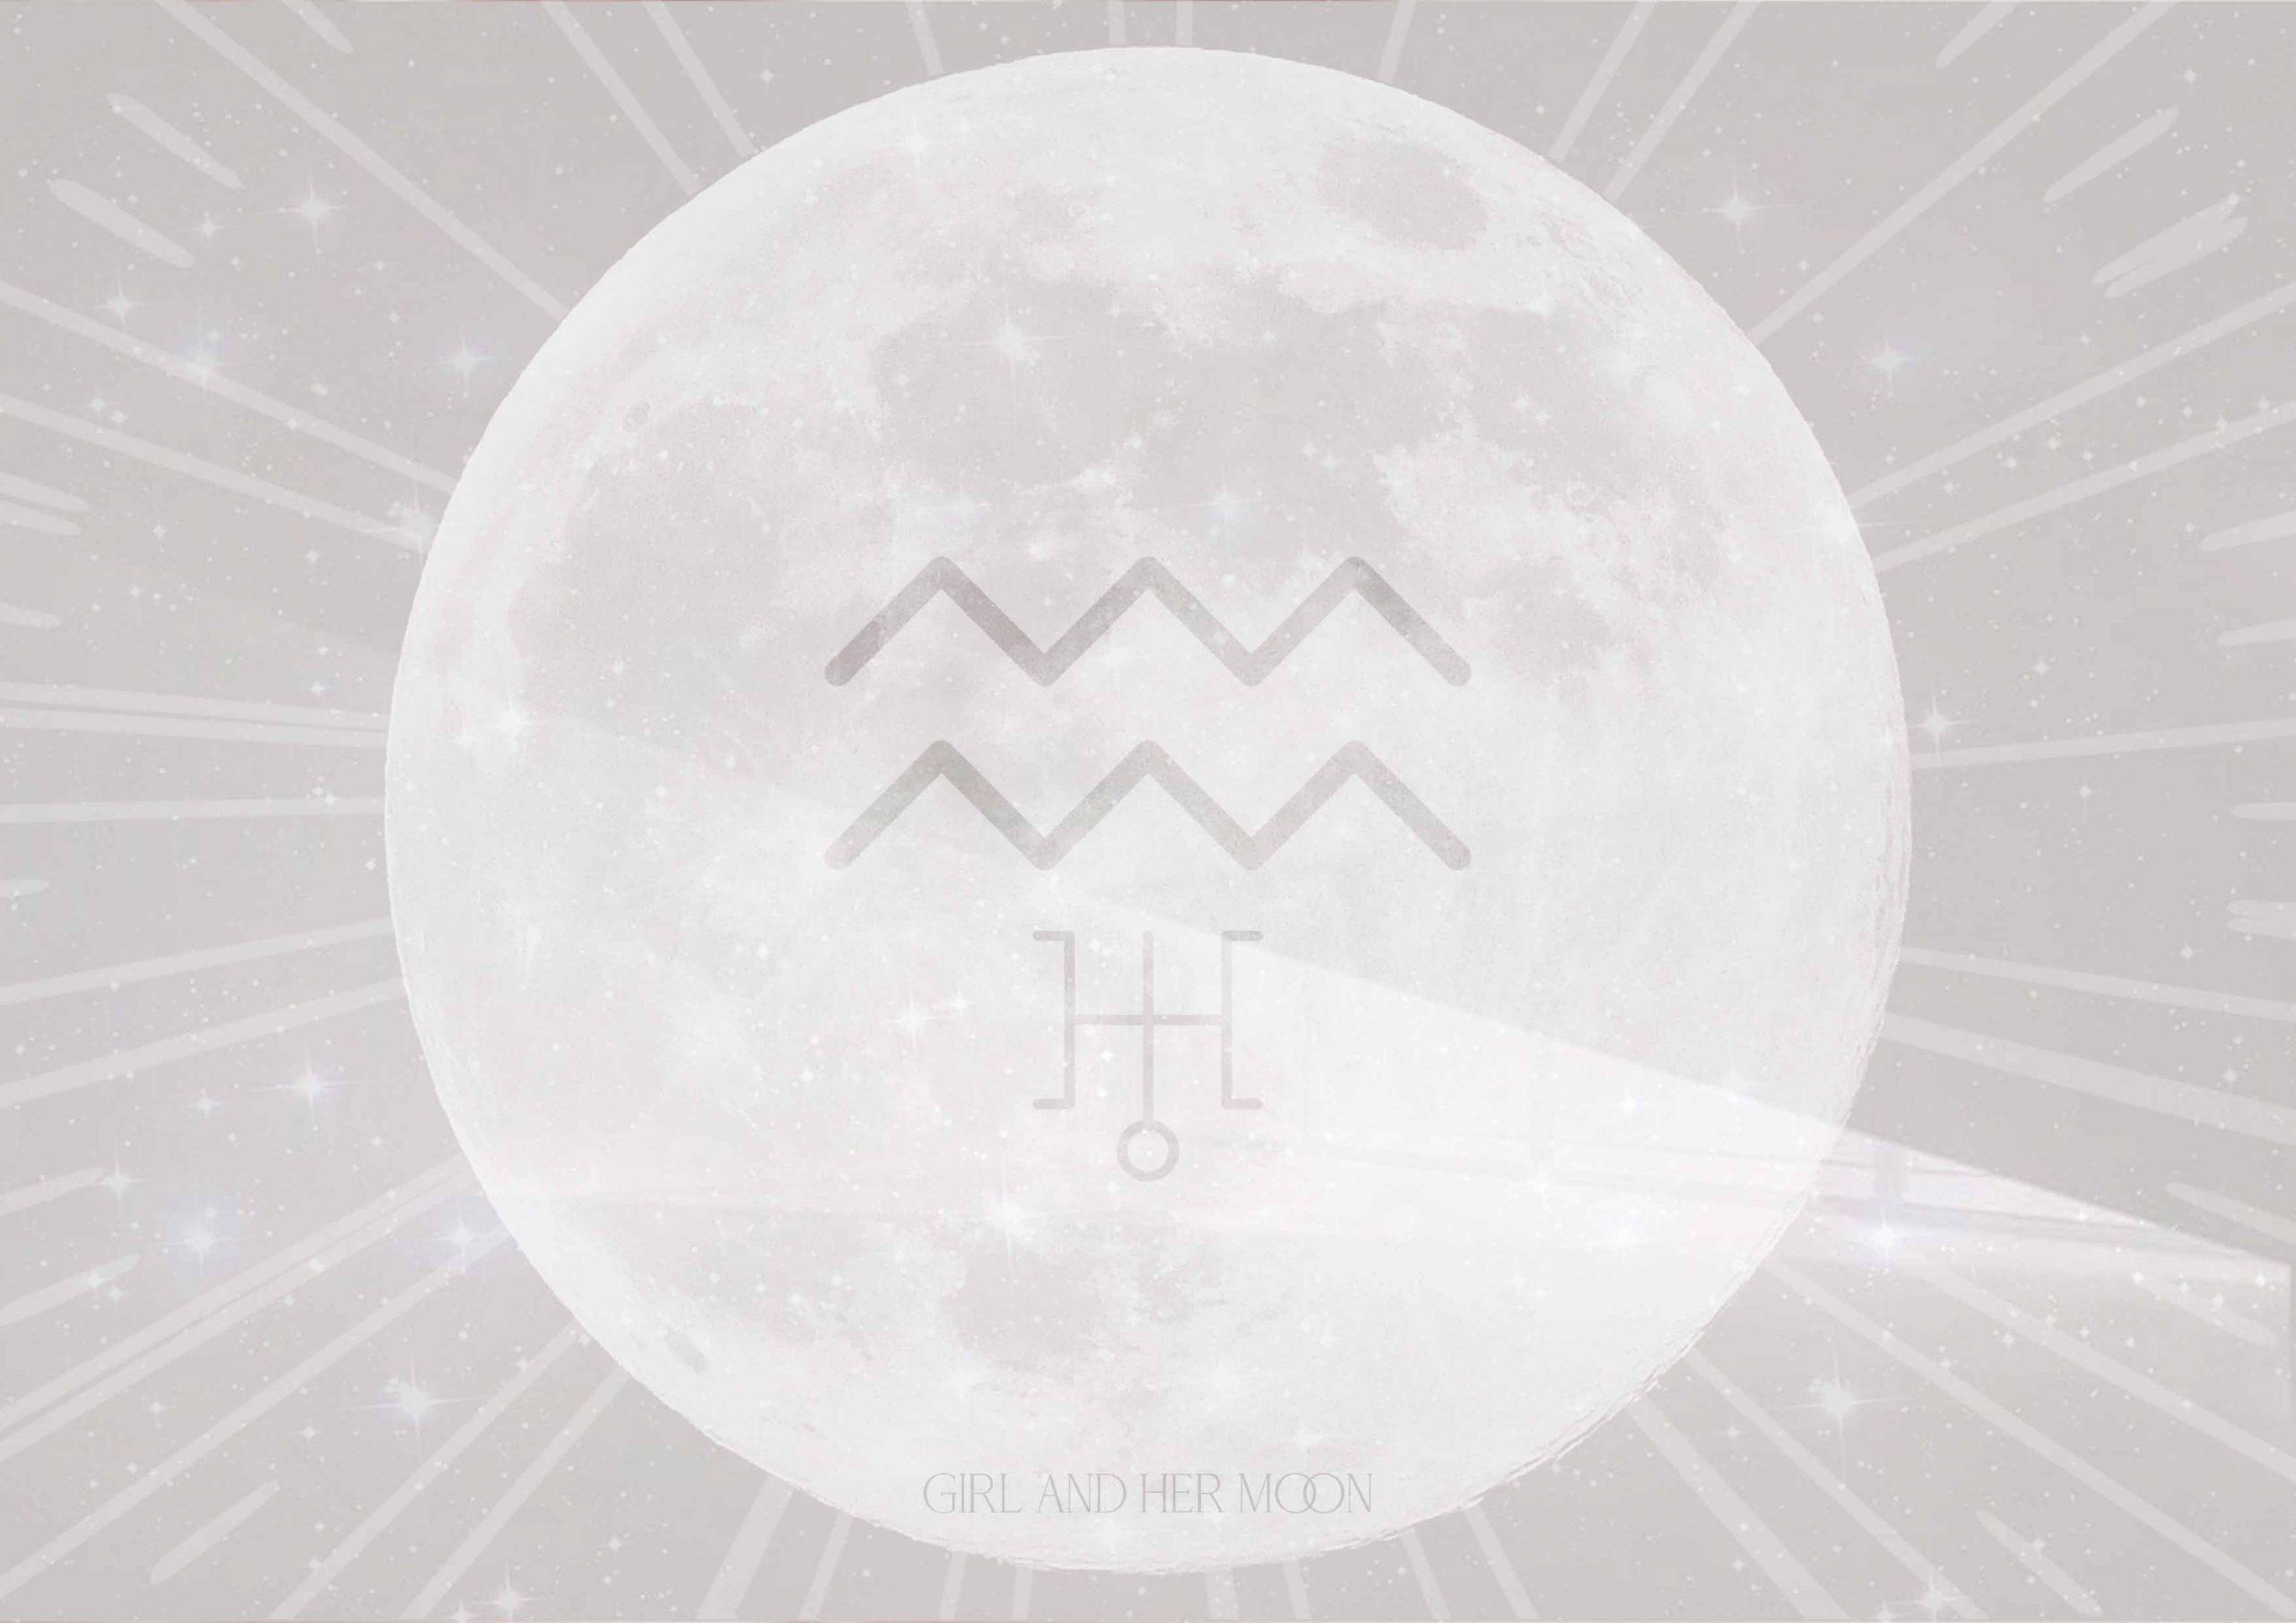 Aquarius Full Moon August 2020 - Girl and Her Moon